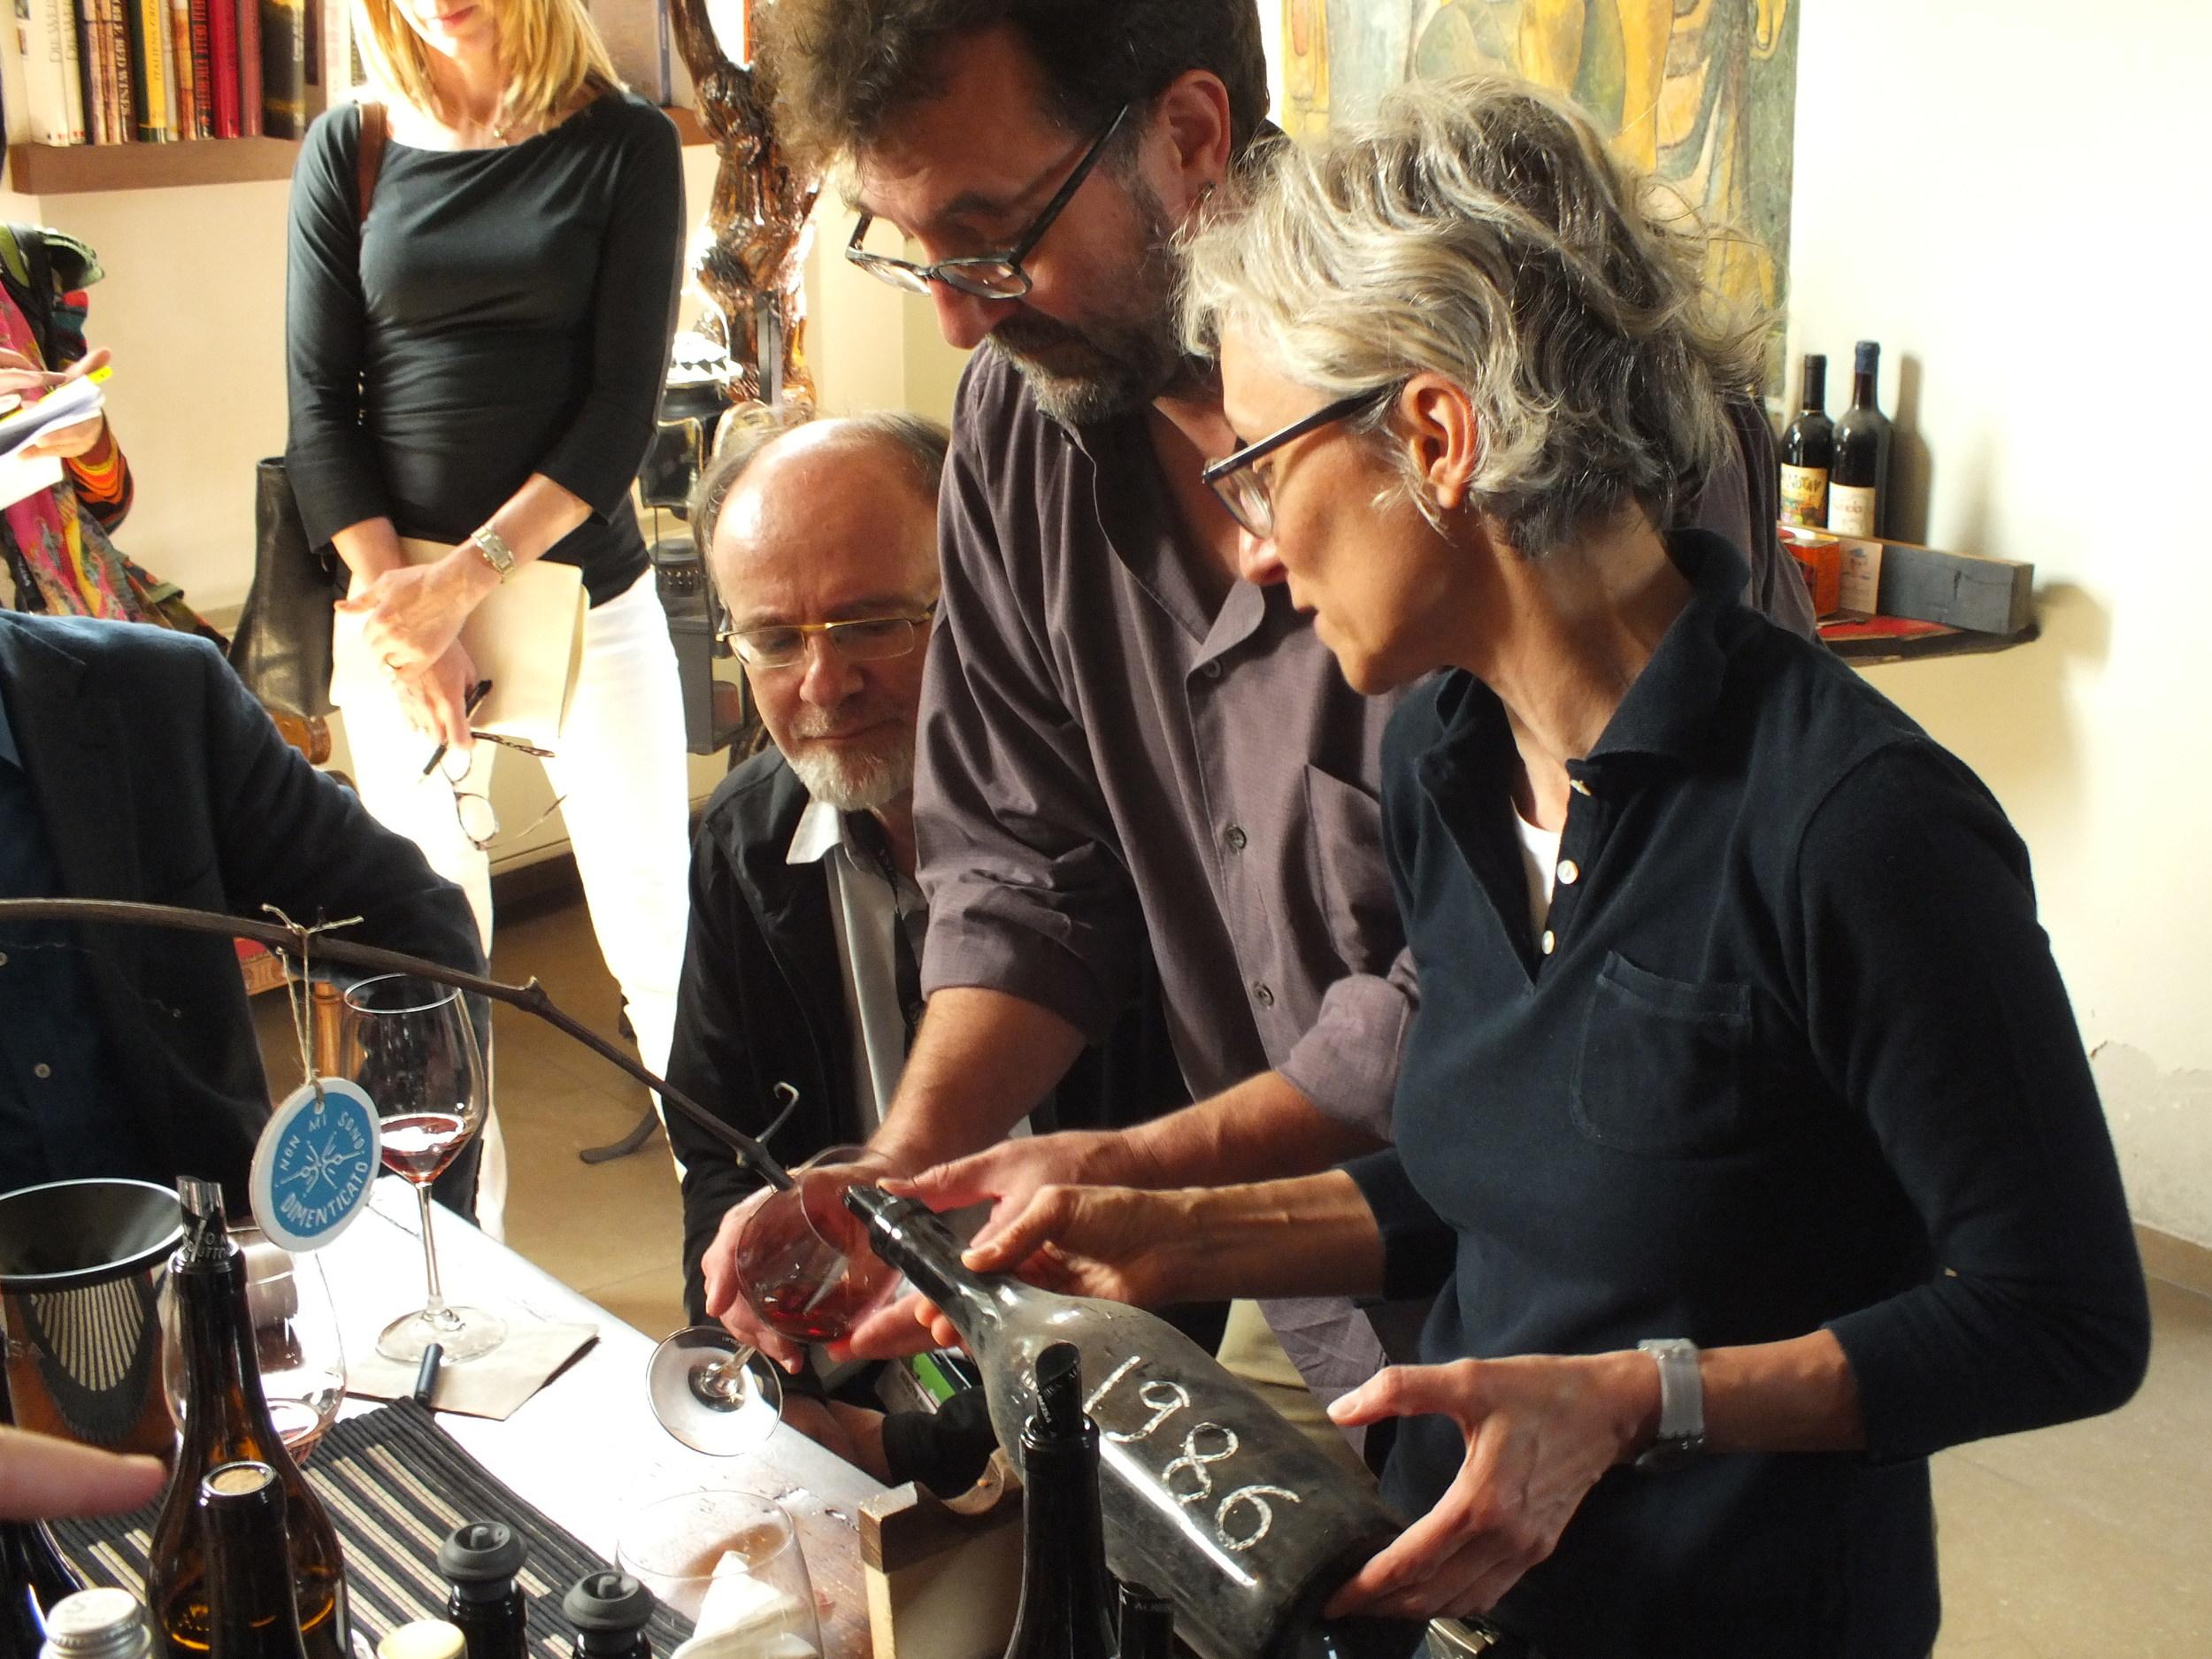 Tasting of a 1986 Mascarello, one of the last wines made by Bartolo Mascarello himself.